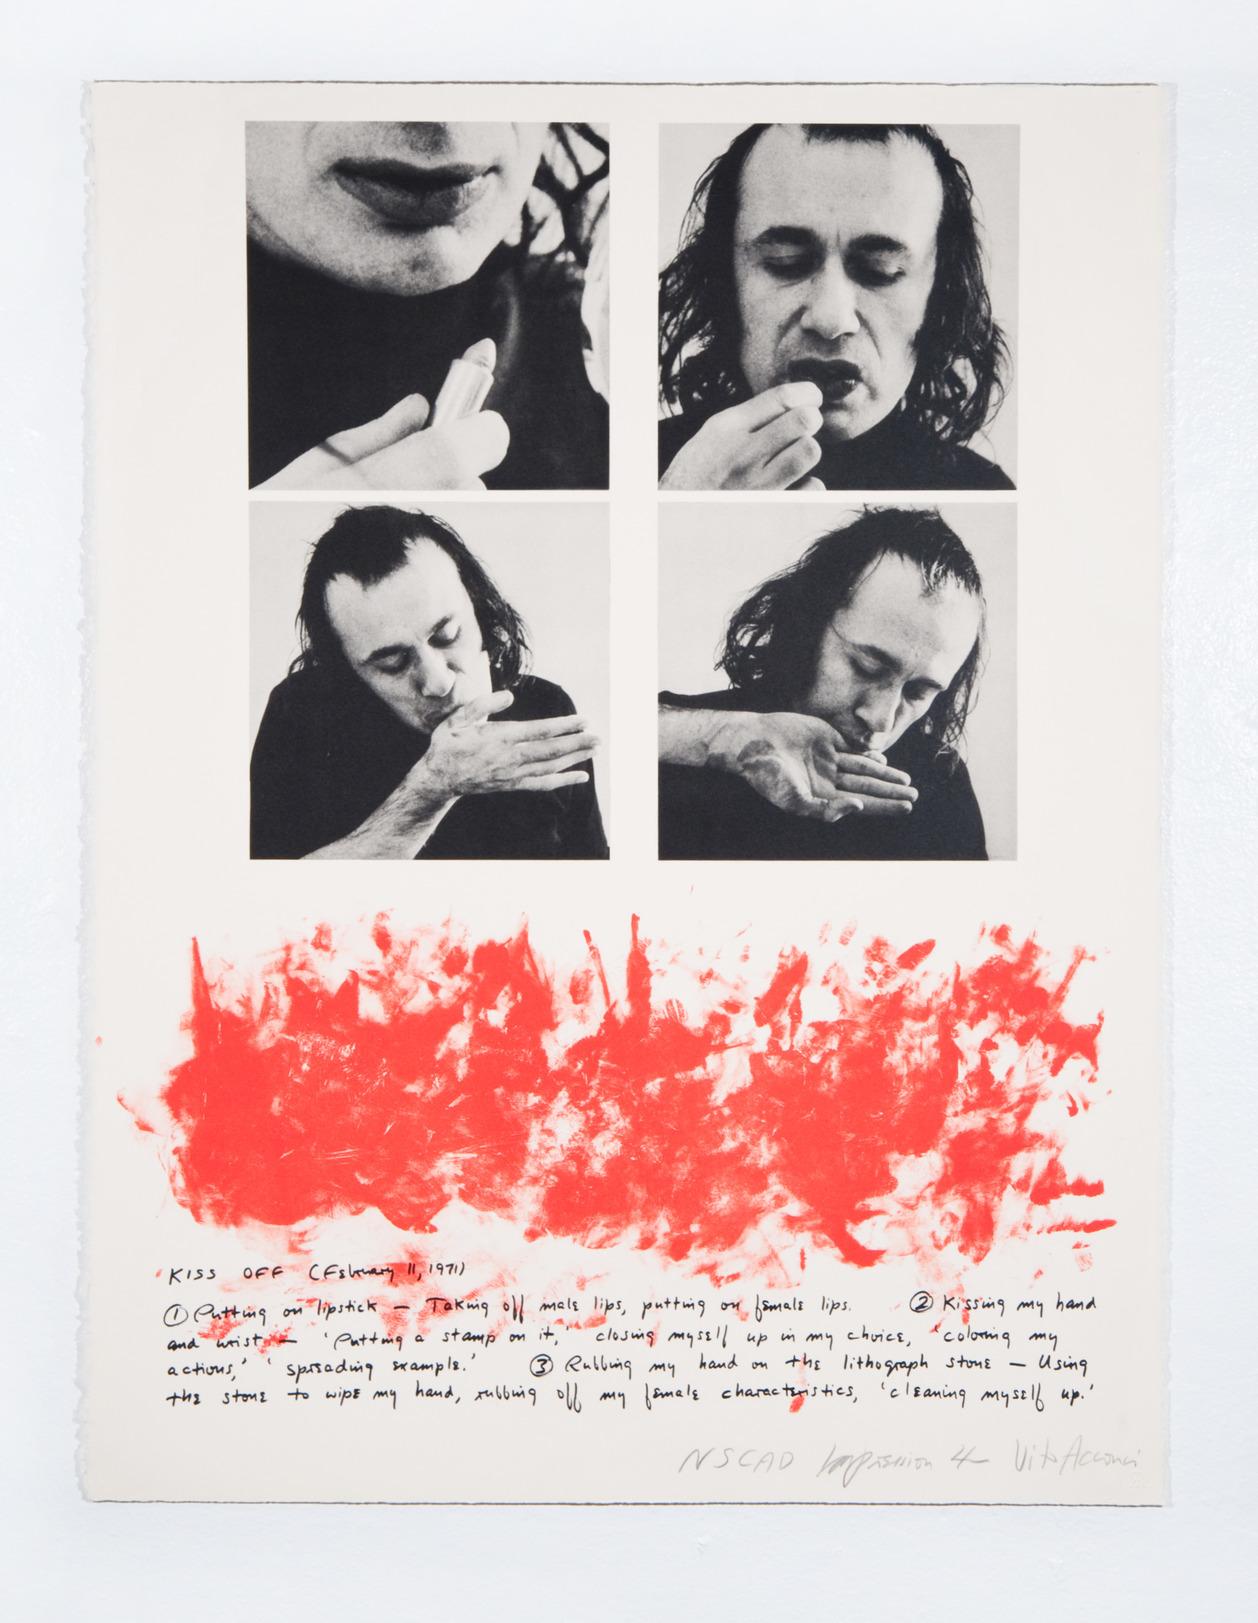 Vito Acconci, Kiss Off, 1971